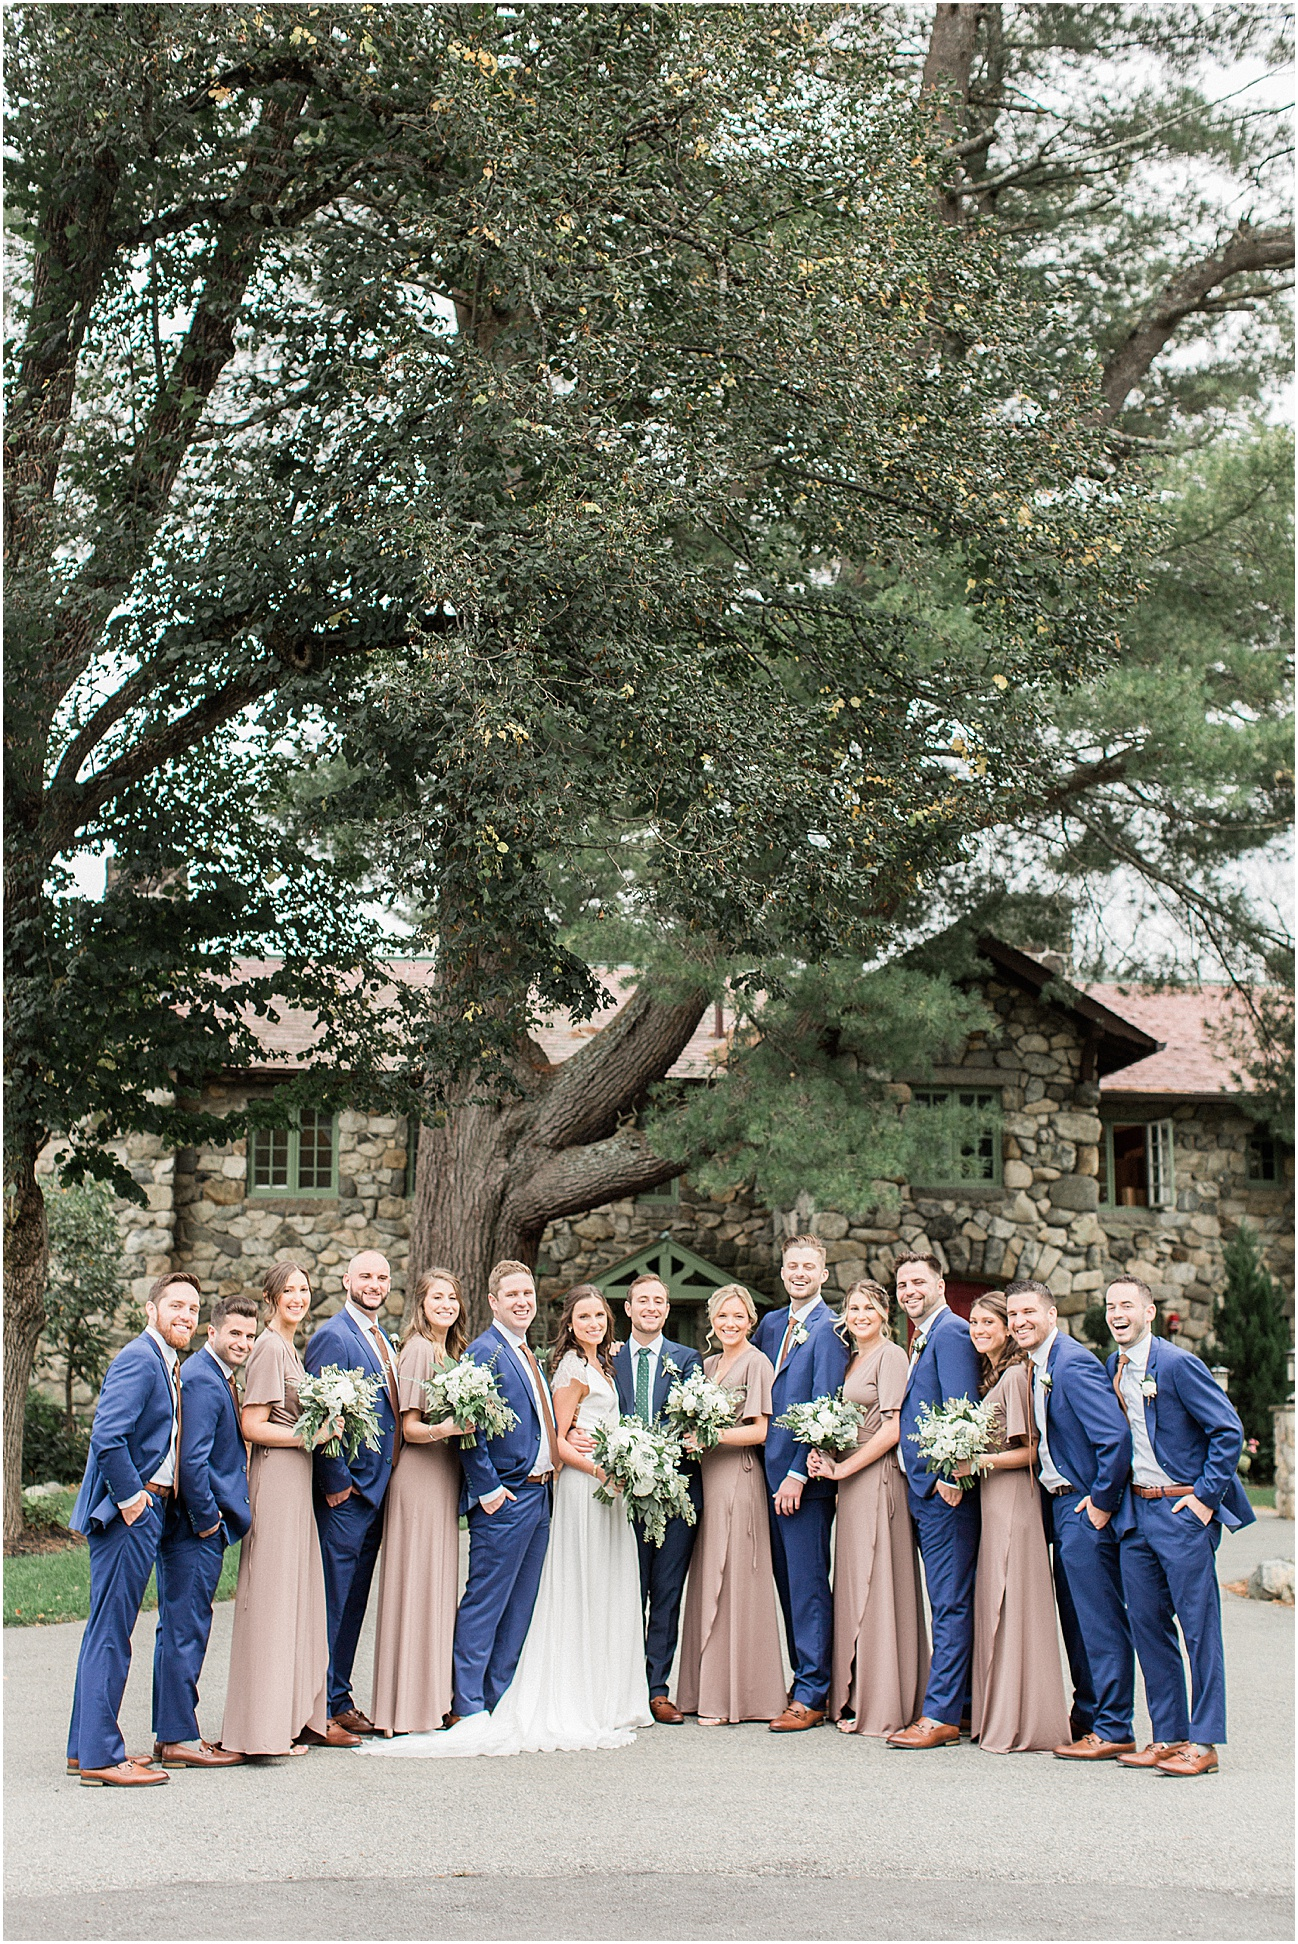 jenna_mike_willowdale_estate_topsfield_neutral_whites_greens_fall_cape_cod_boston_wedding_photographer_meredith_jane_photography_photo_1464.jpg